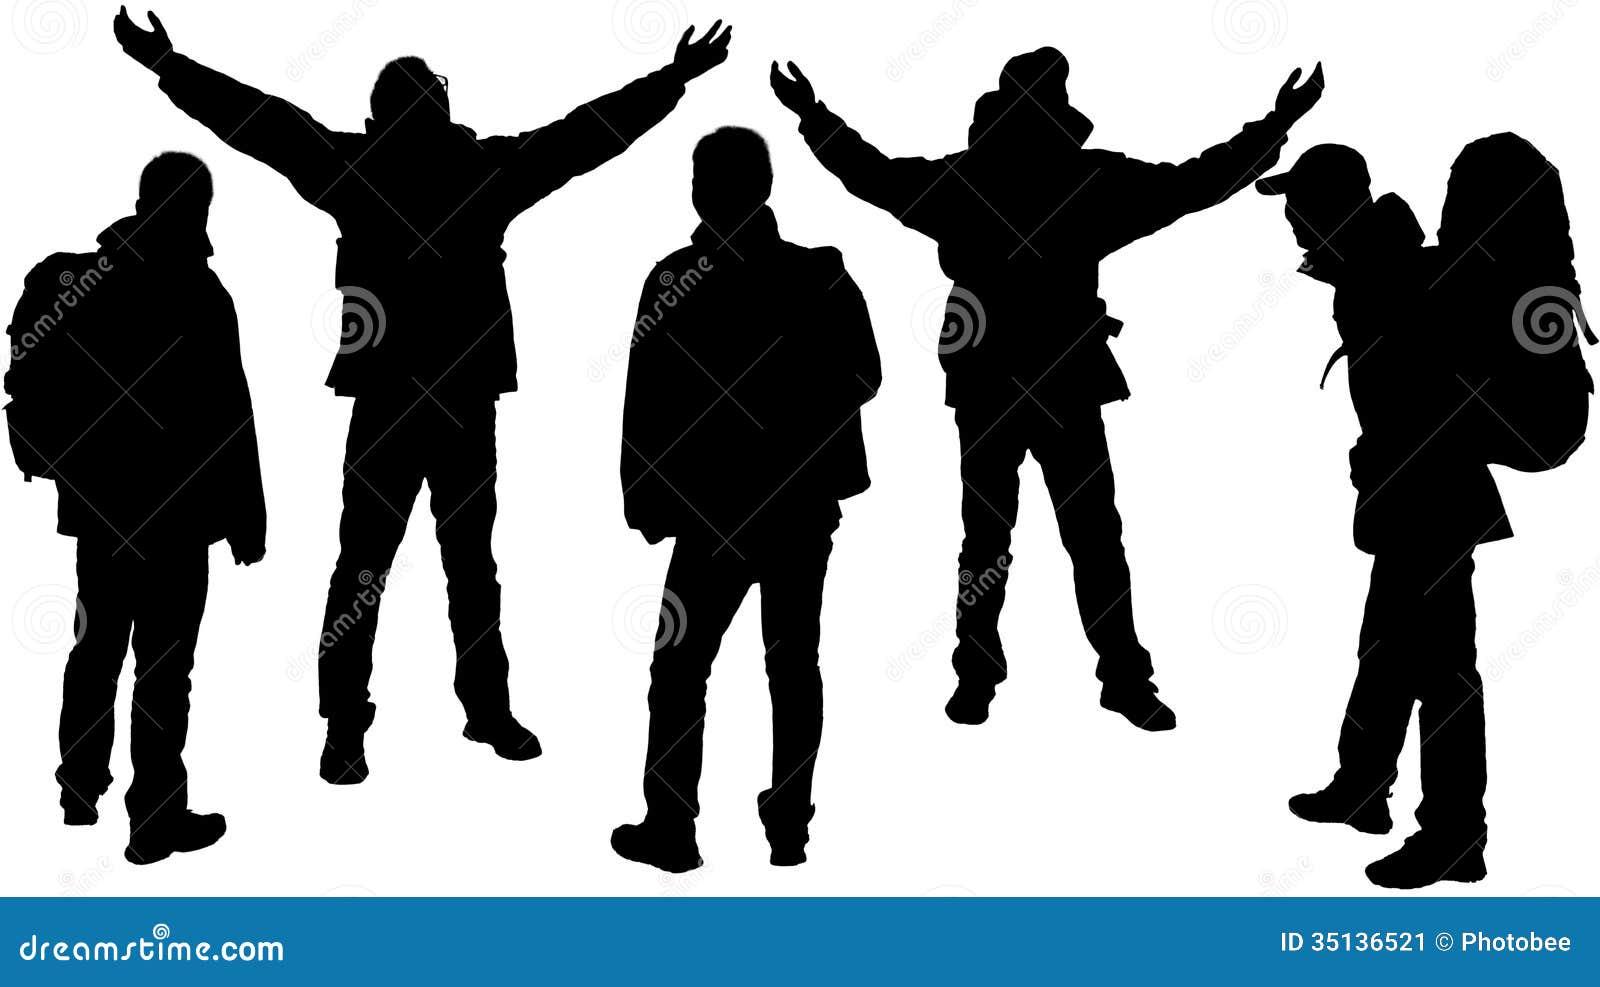 hiking silhouette desktop wallpaper - photo #31